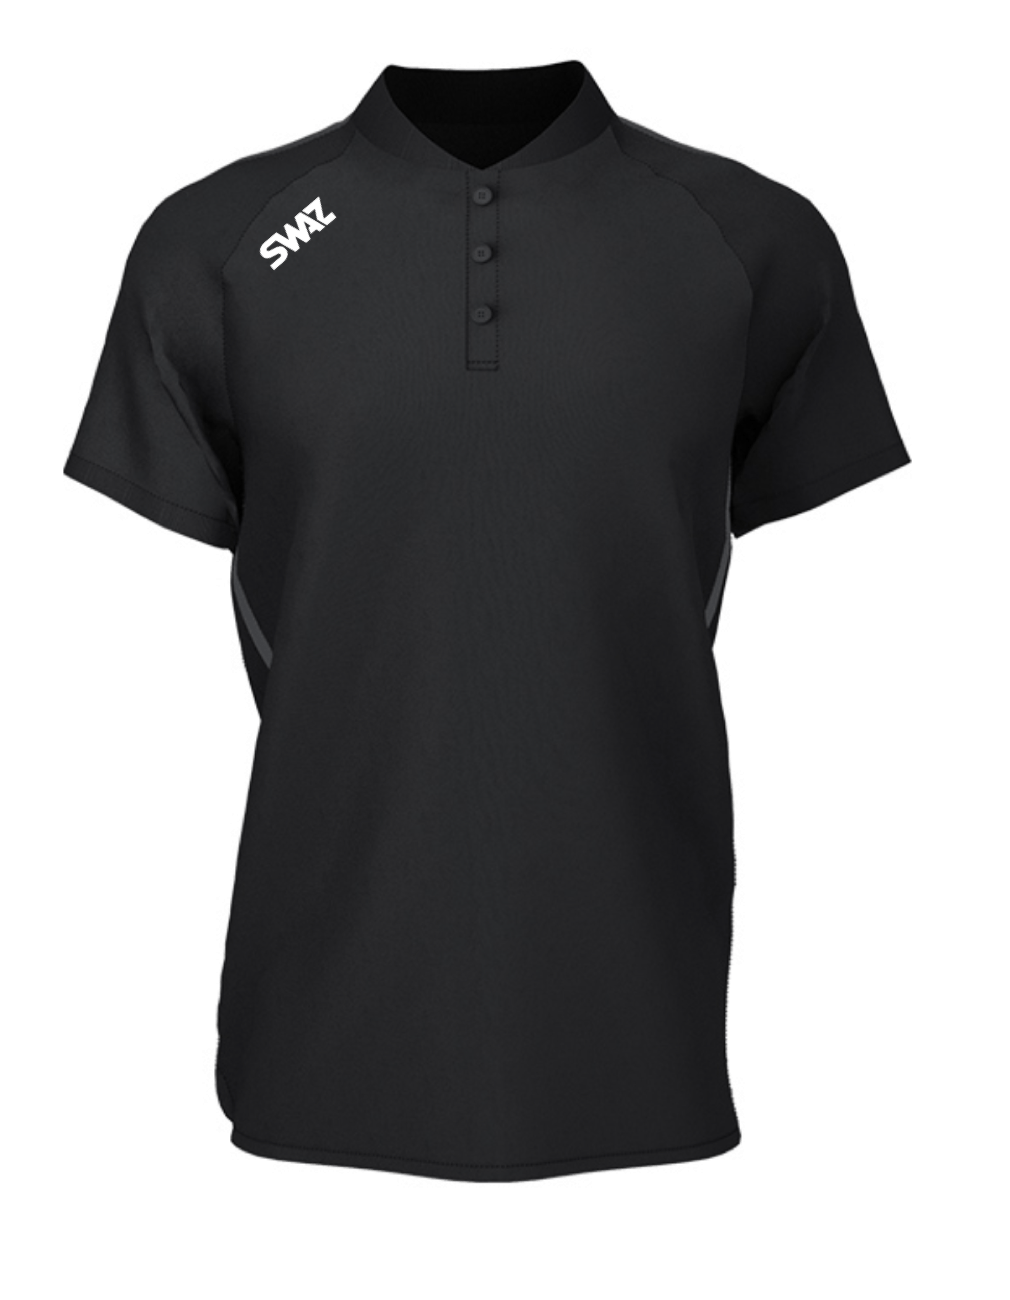 SWAZ Elite Black Polo Shirt   Football Teamwear